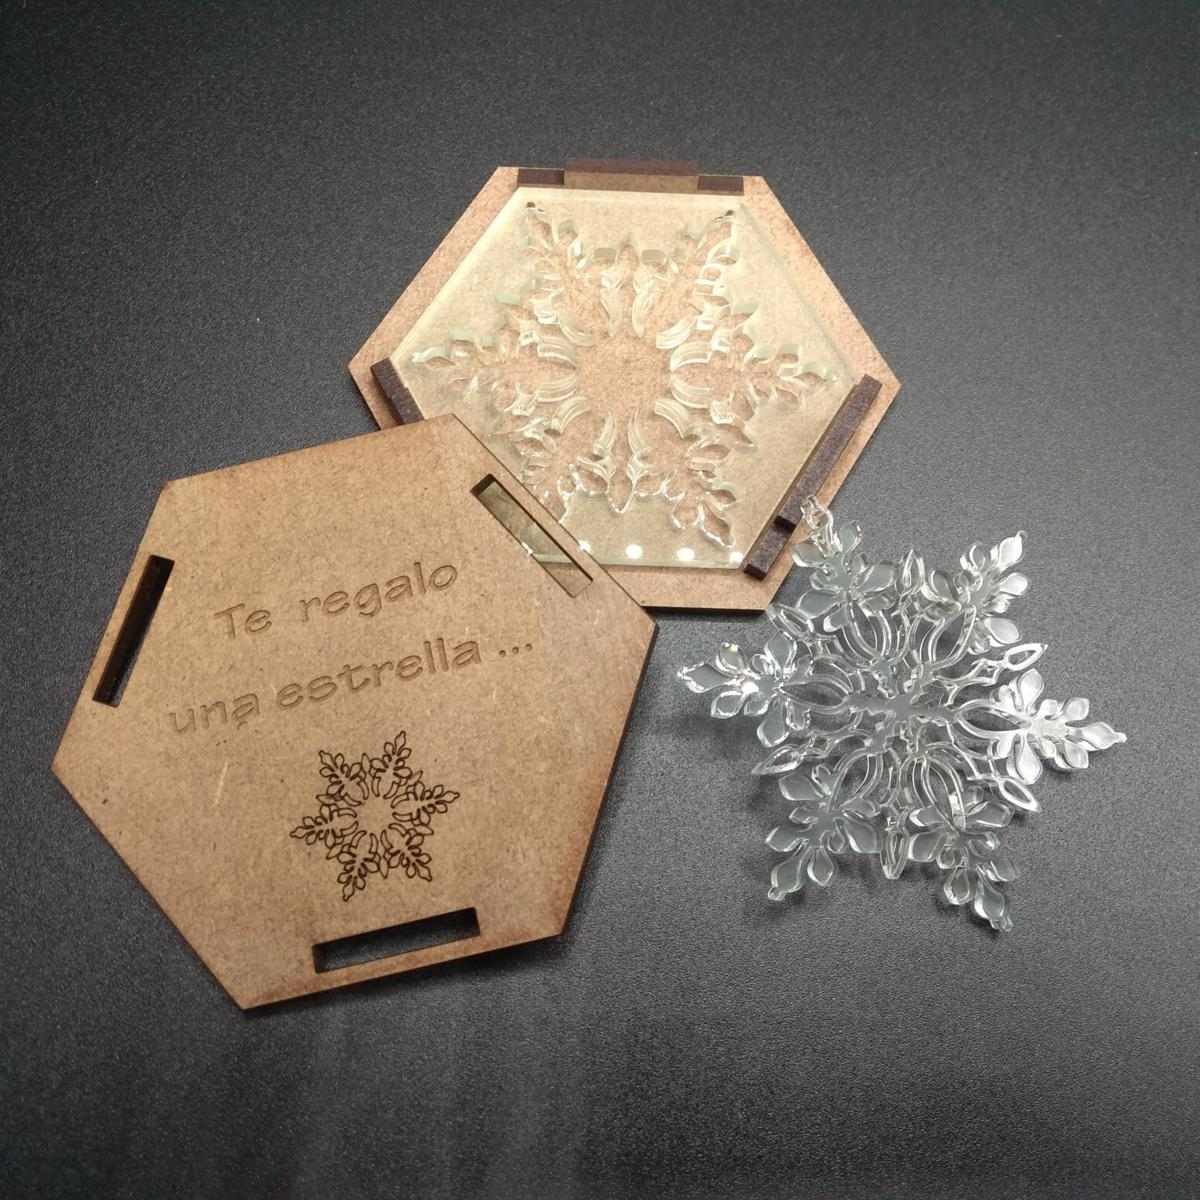 Estrella metacrilato con caja (modelo 3)